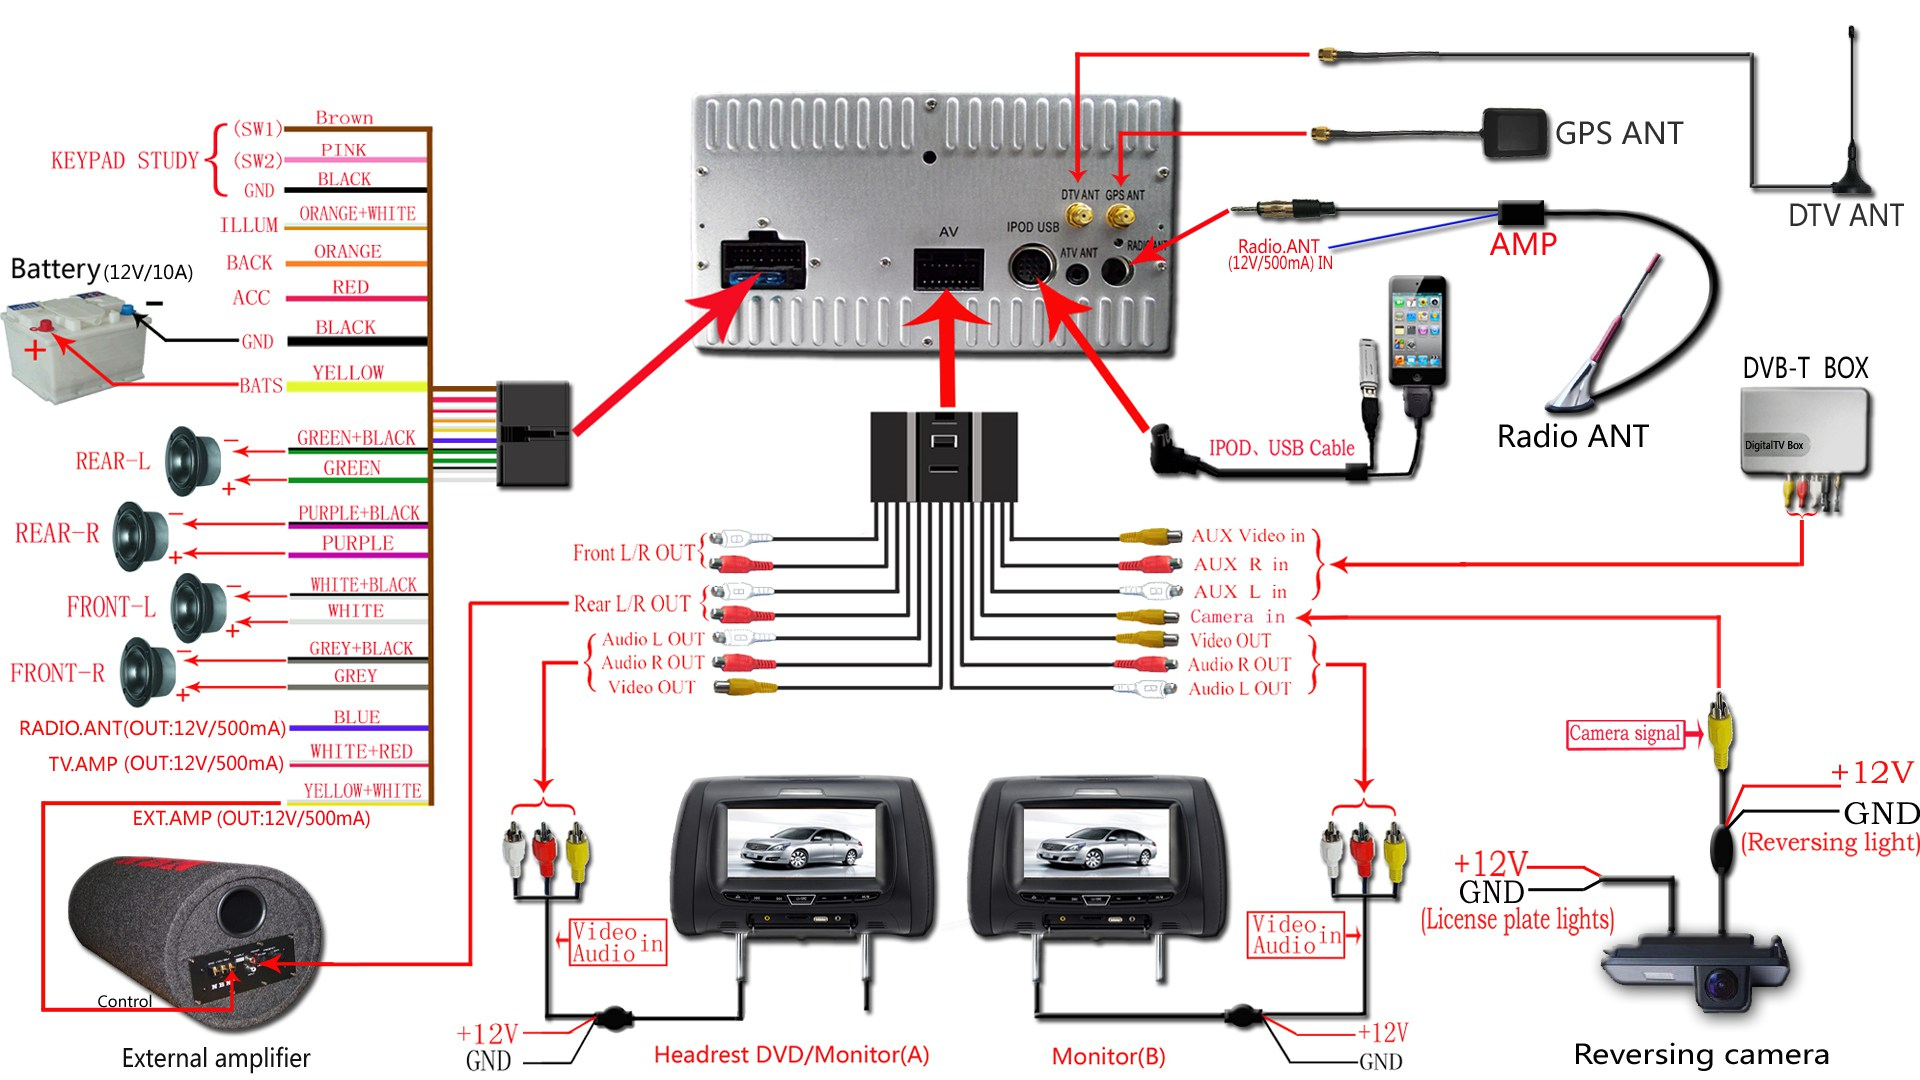 DIAGRAM] Bmw Professional Radio Wiring Diagram FULL Version HD Quality Wiring  Diagram - WIRING.AIKIKAI-DES-LACS.FRDiagram Database - Aikikai-des-lacs.fr